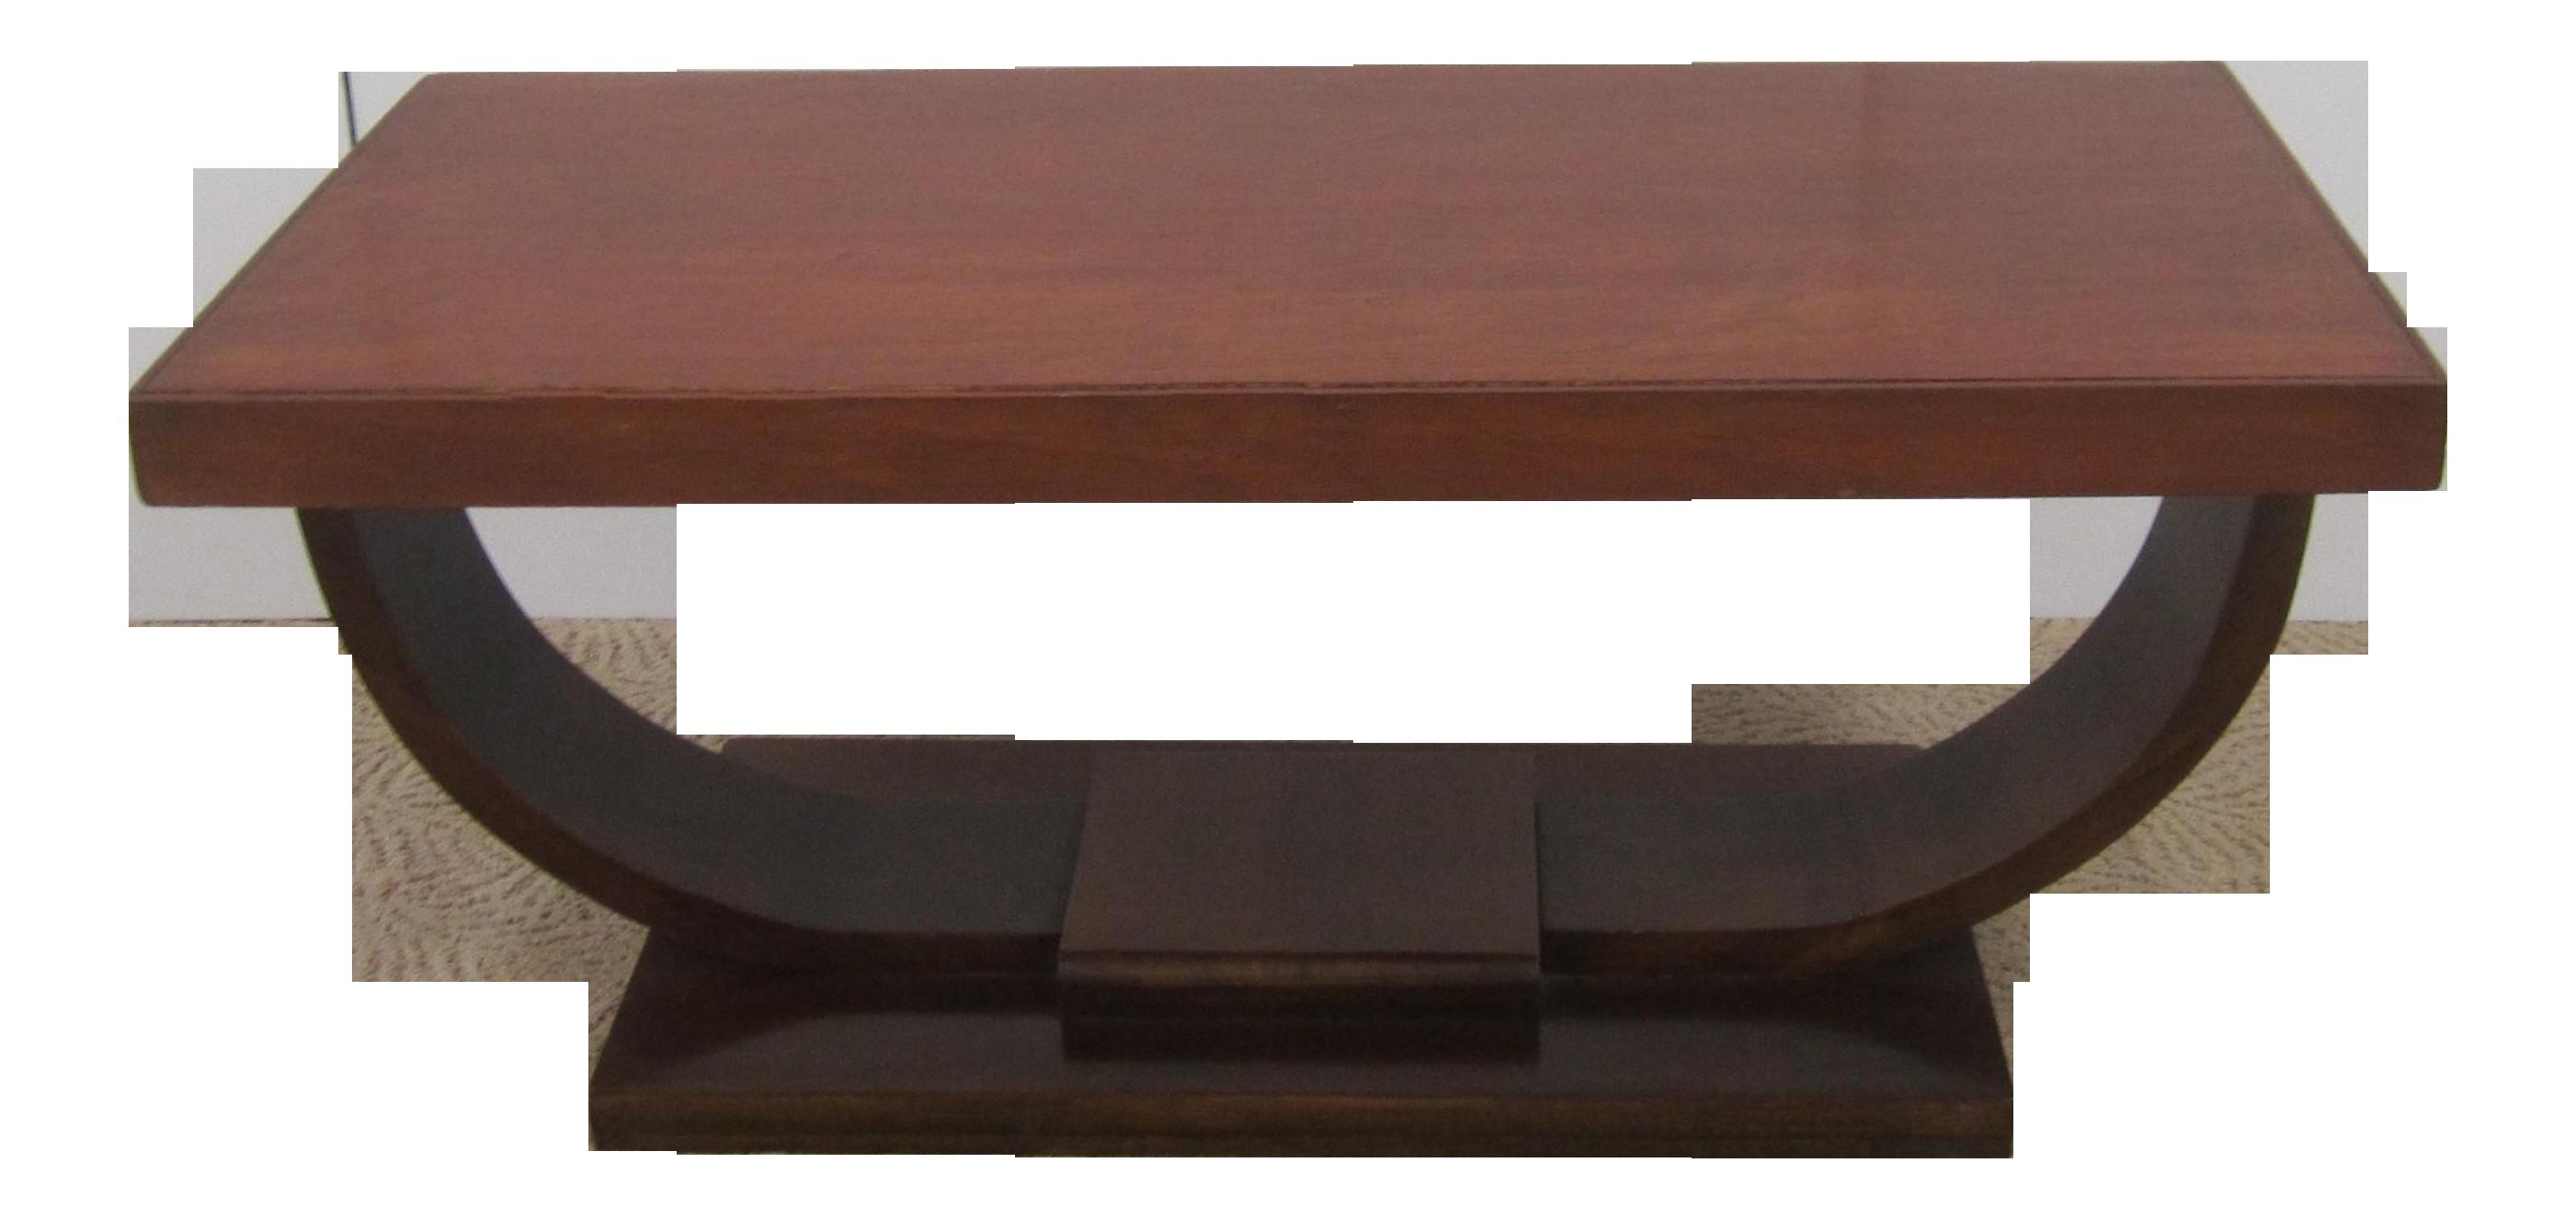 1940s Art Deco Coffee Table on Chairish